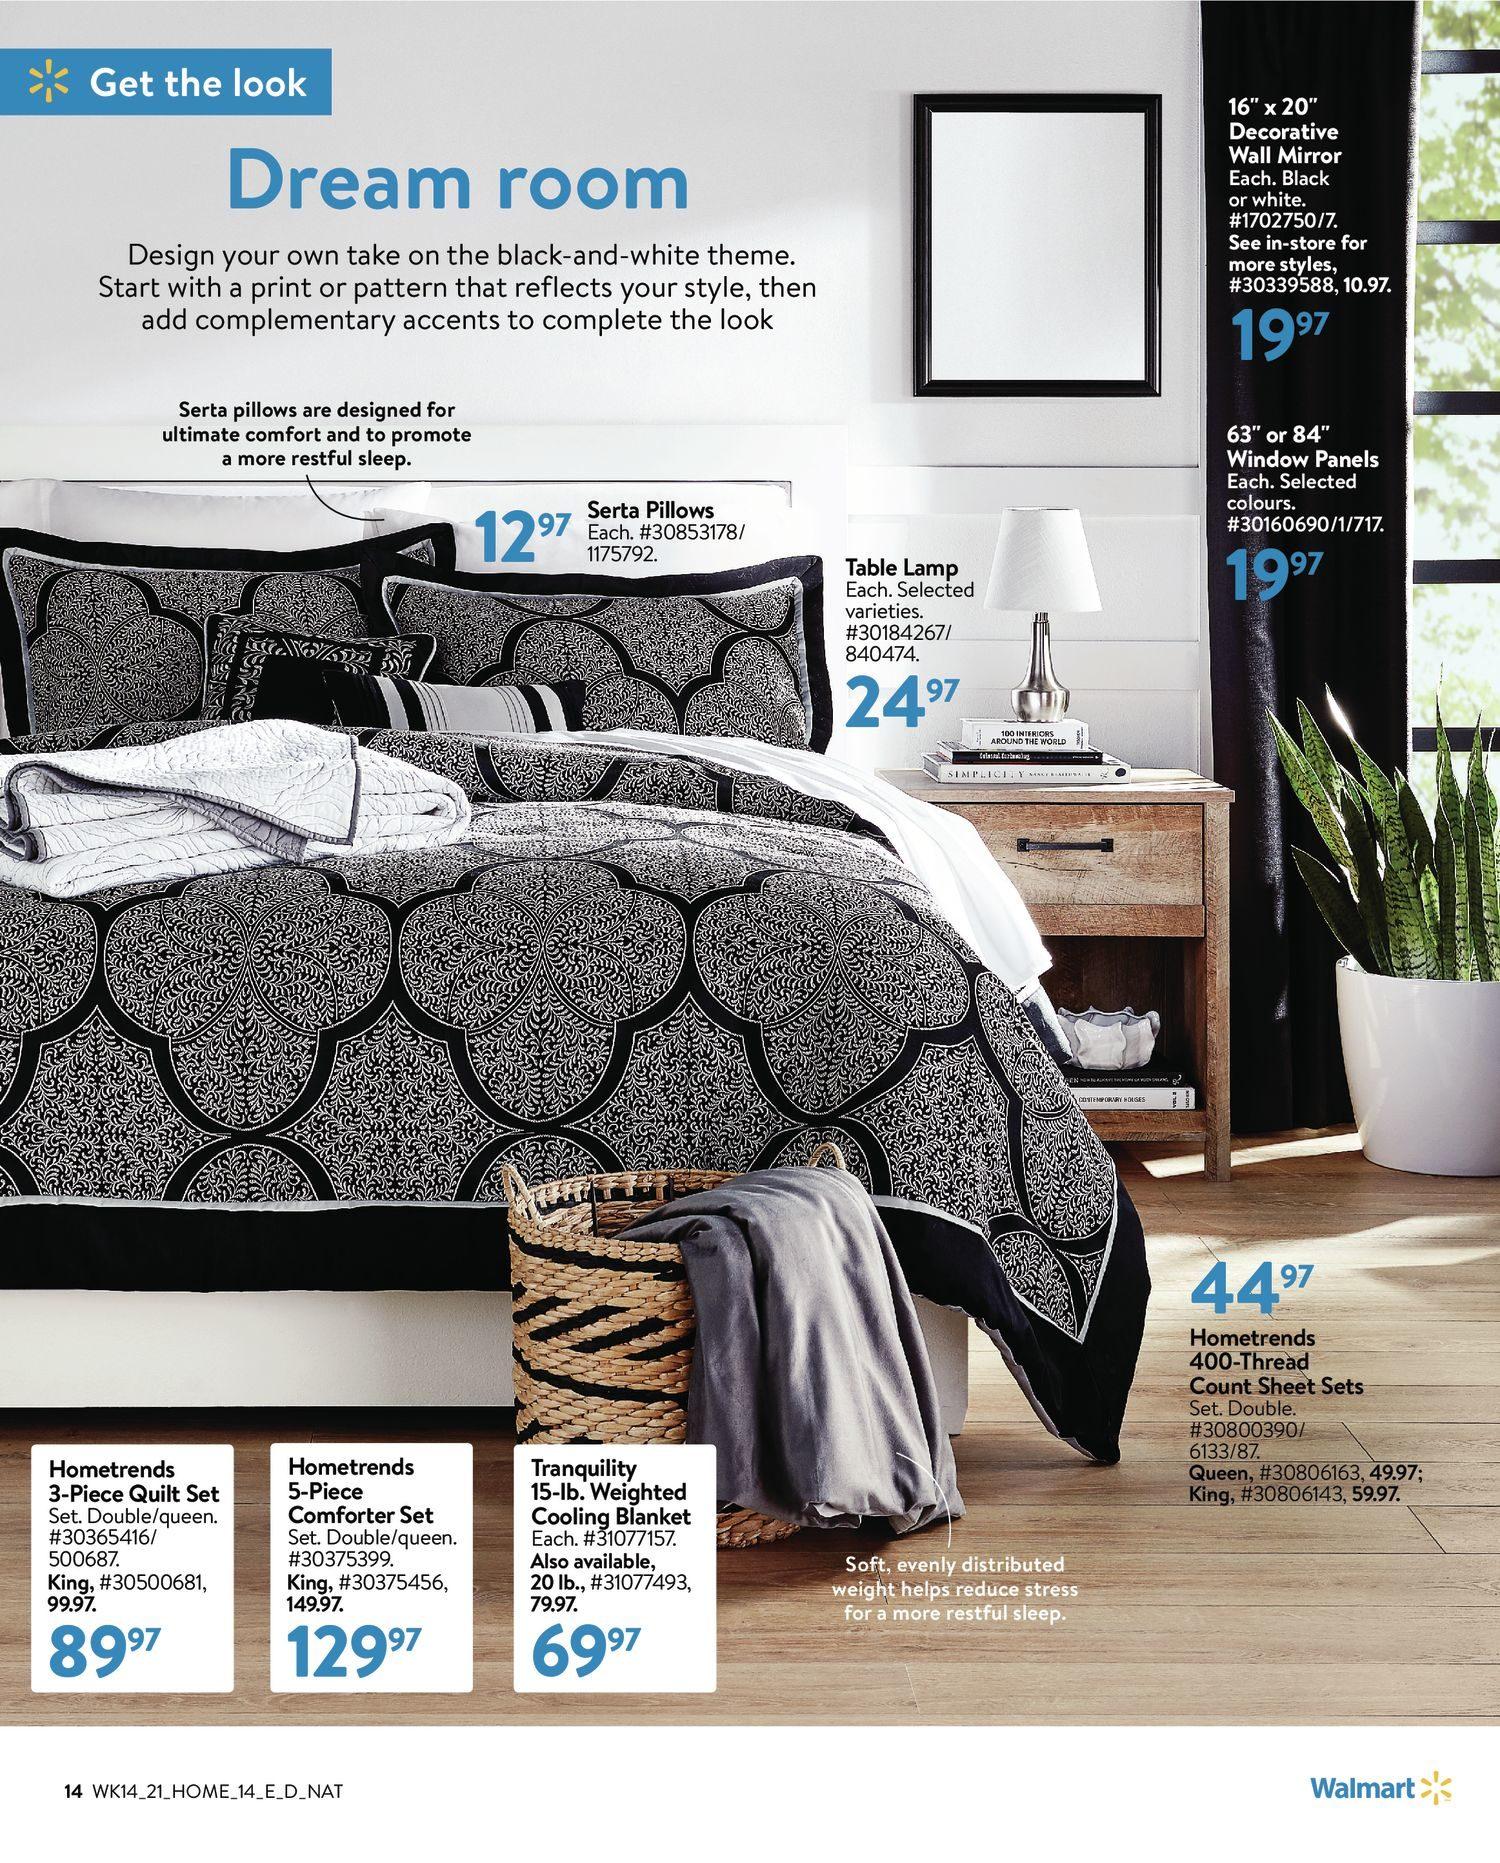 Walmart - Home Book - Page 14